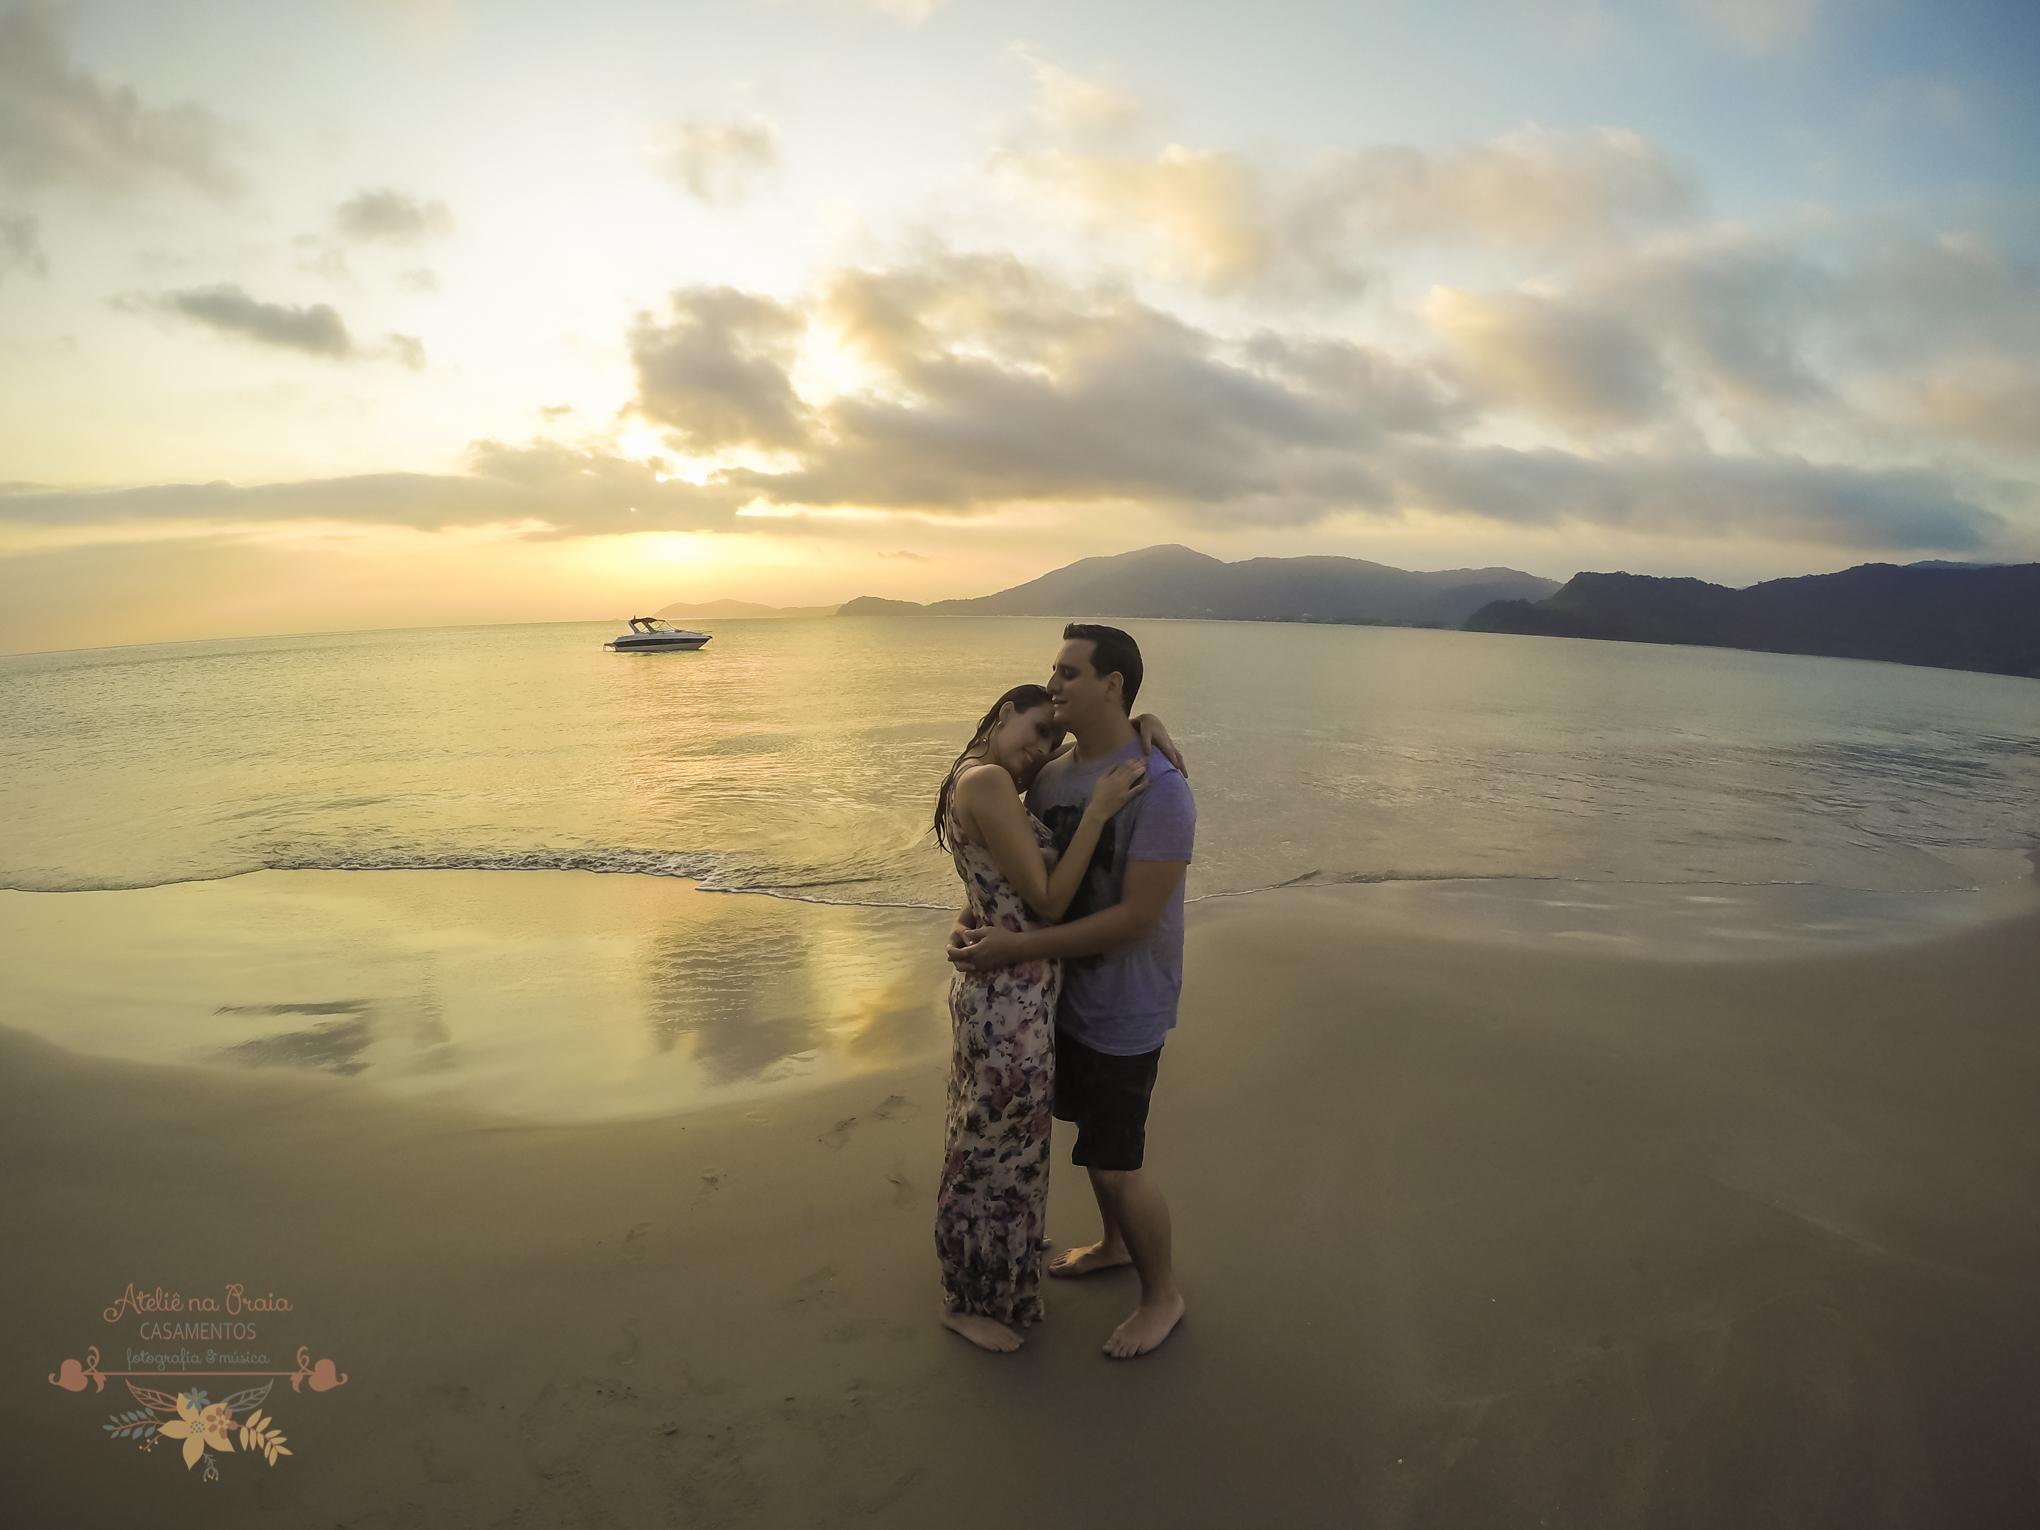 Atelie-na-Praia-Pre-Wedding-Thiesa-Bruno-PQ-0032064